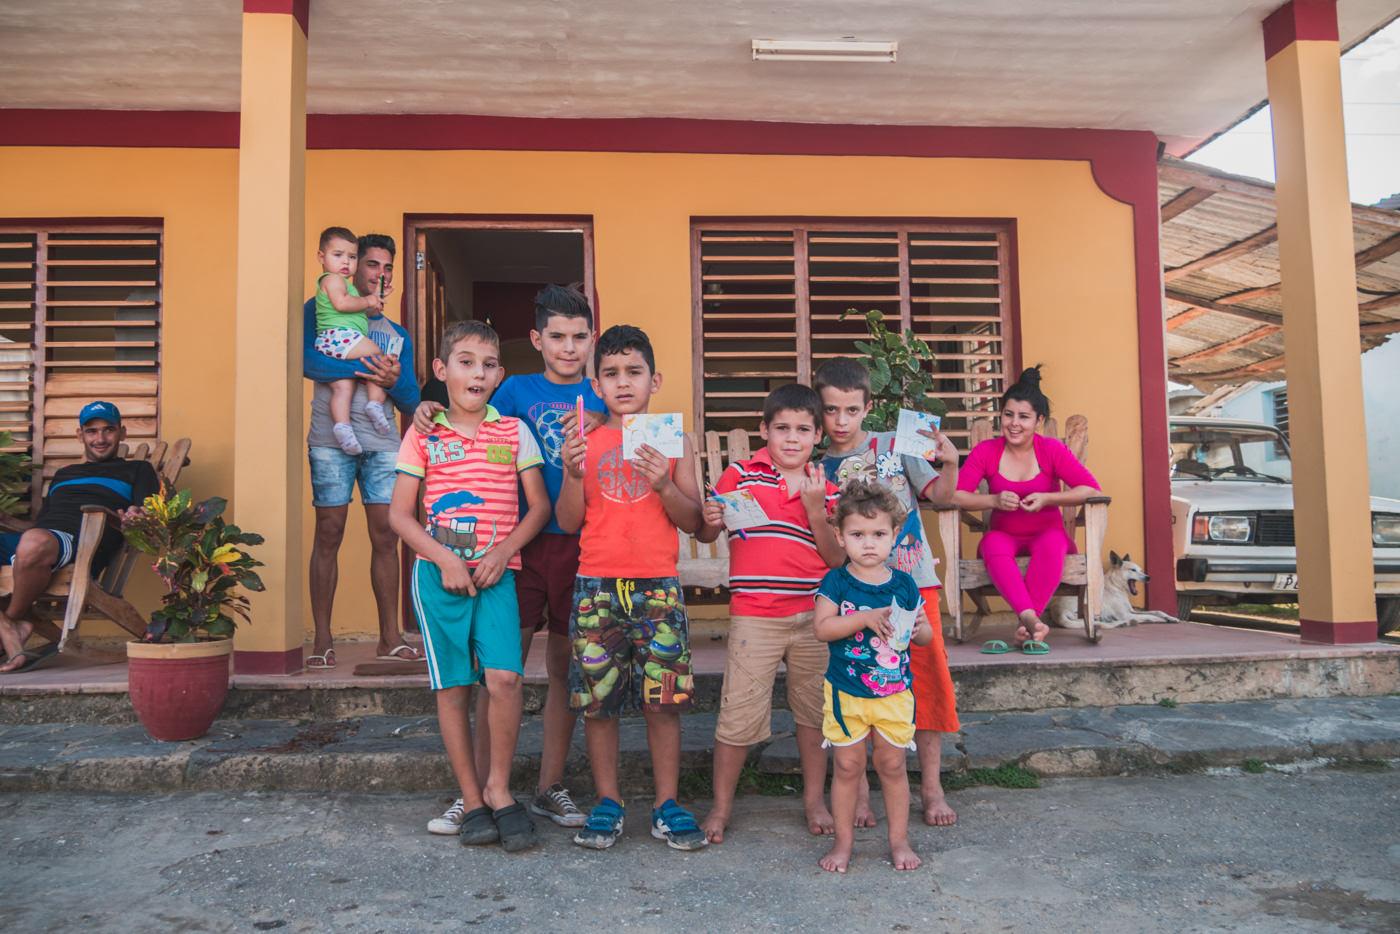 Kinder auf Kuba mit dem Explainora Malbuch